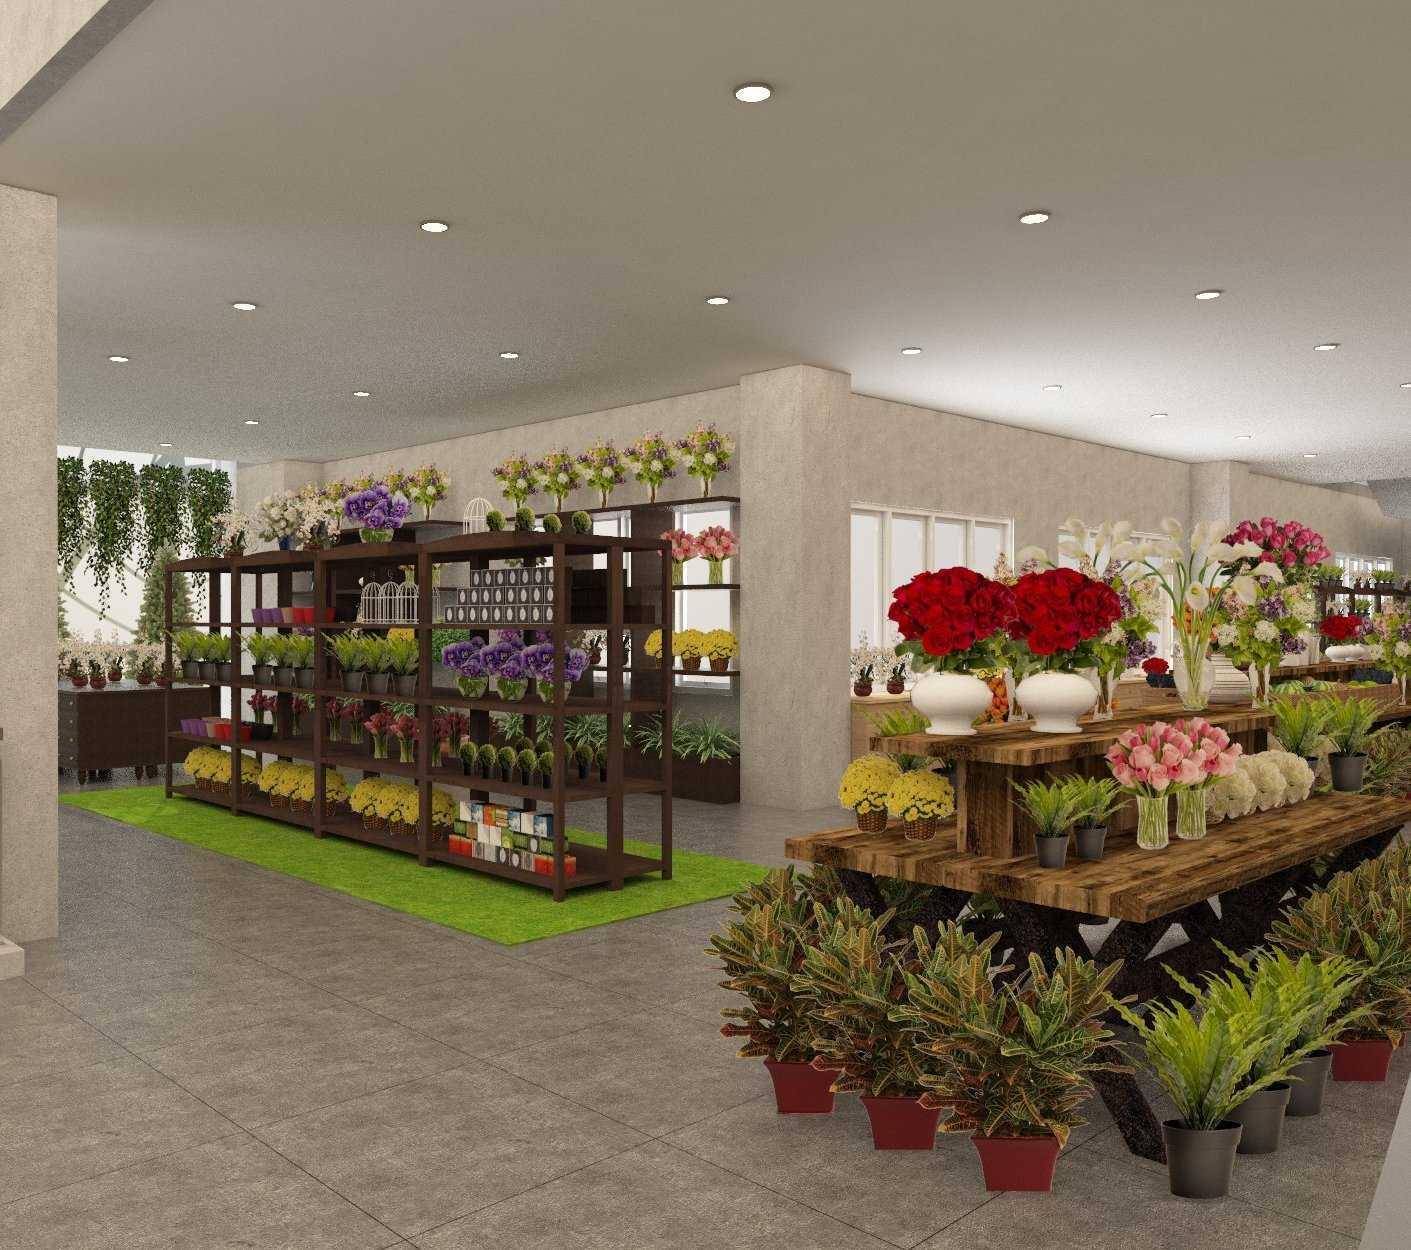 Conarch Studio Kembang Mas Store Surakarta, Kota Surakarta, Jawa Tengah, Indonesia Surakarta, Kota Surakarta, Jawa Tengah, Indonesia Conarch-Bangun-Sejahtera-Kembang-Mas-Store  59488